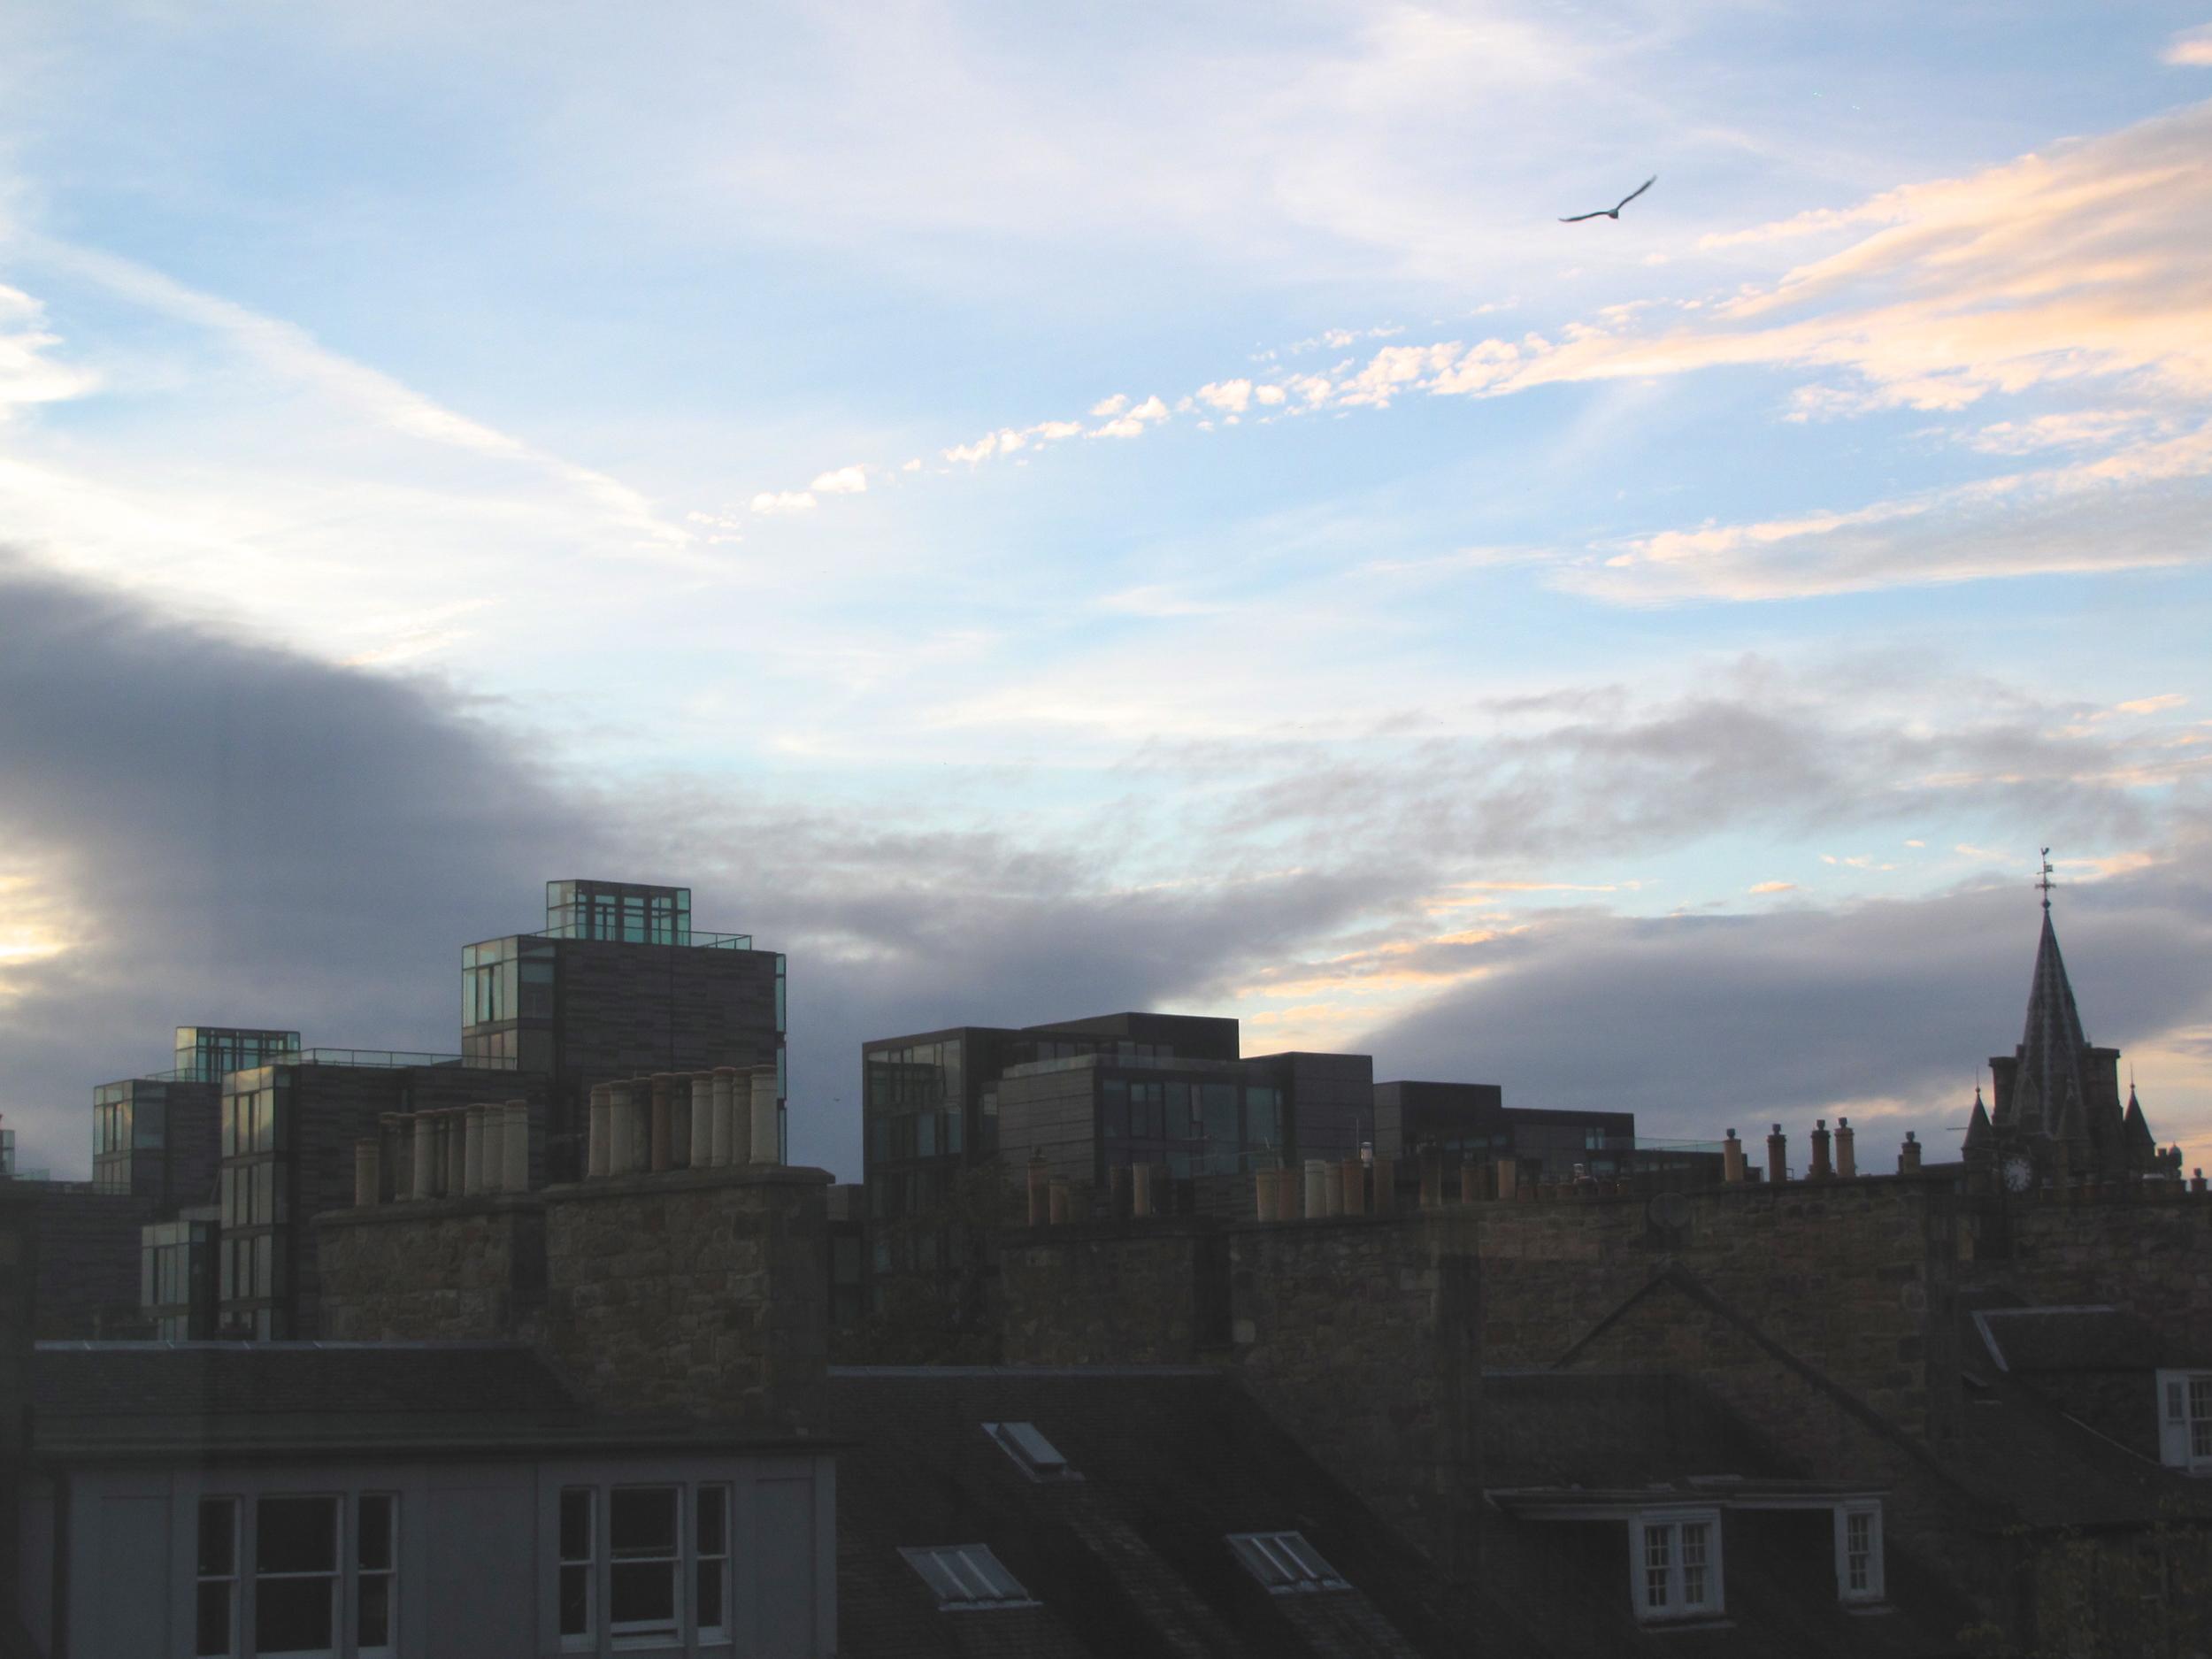 Edinburgh skyline from the University Library, at dusk.